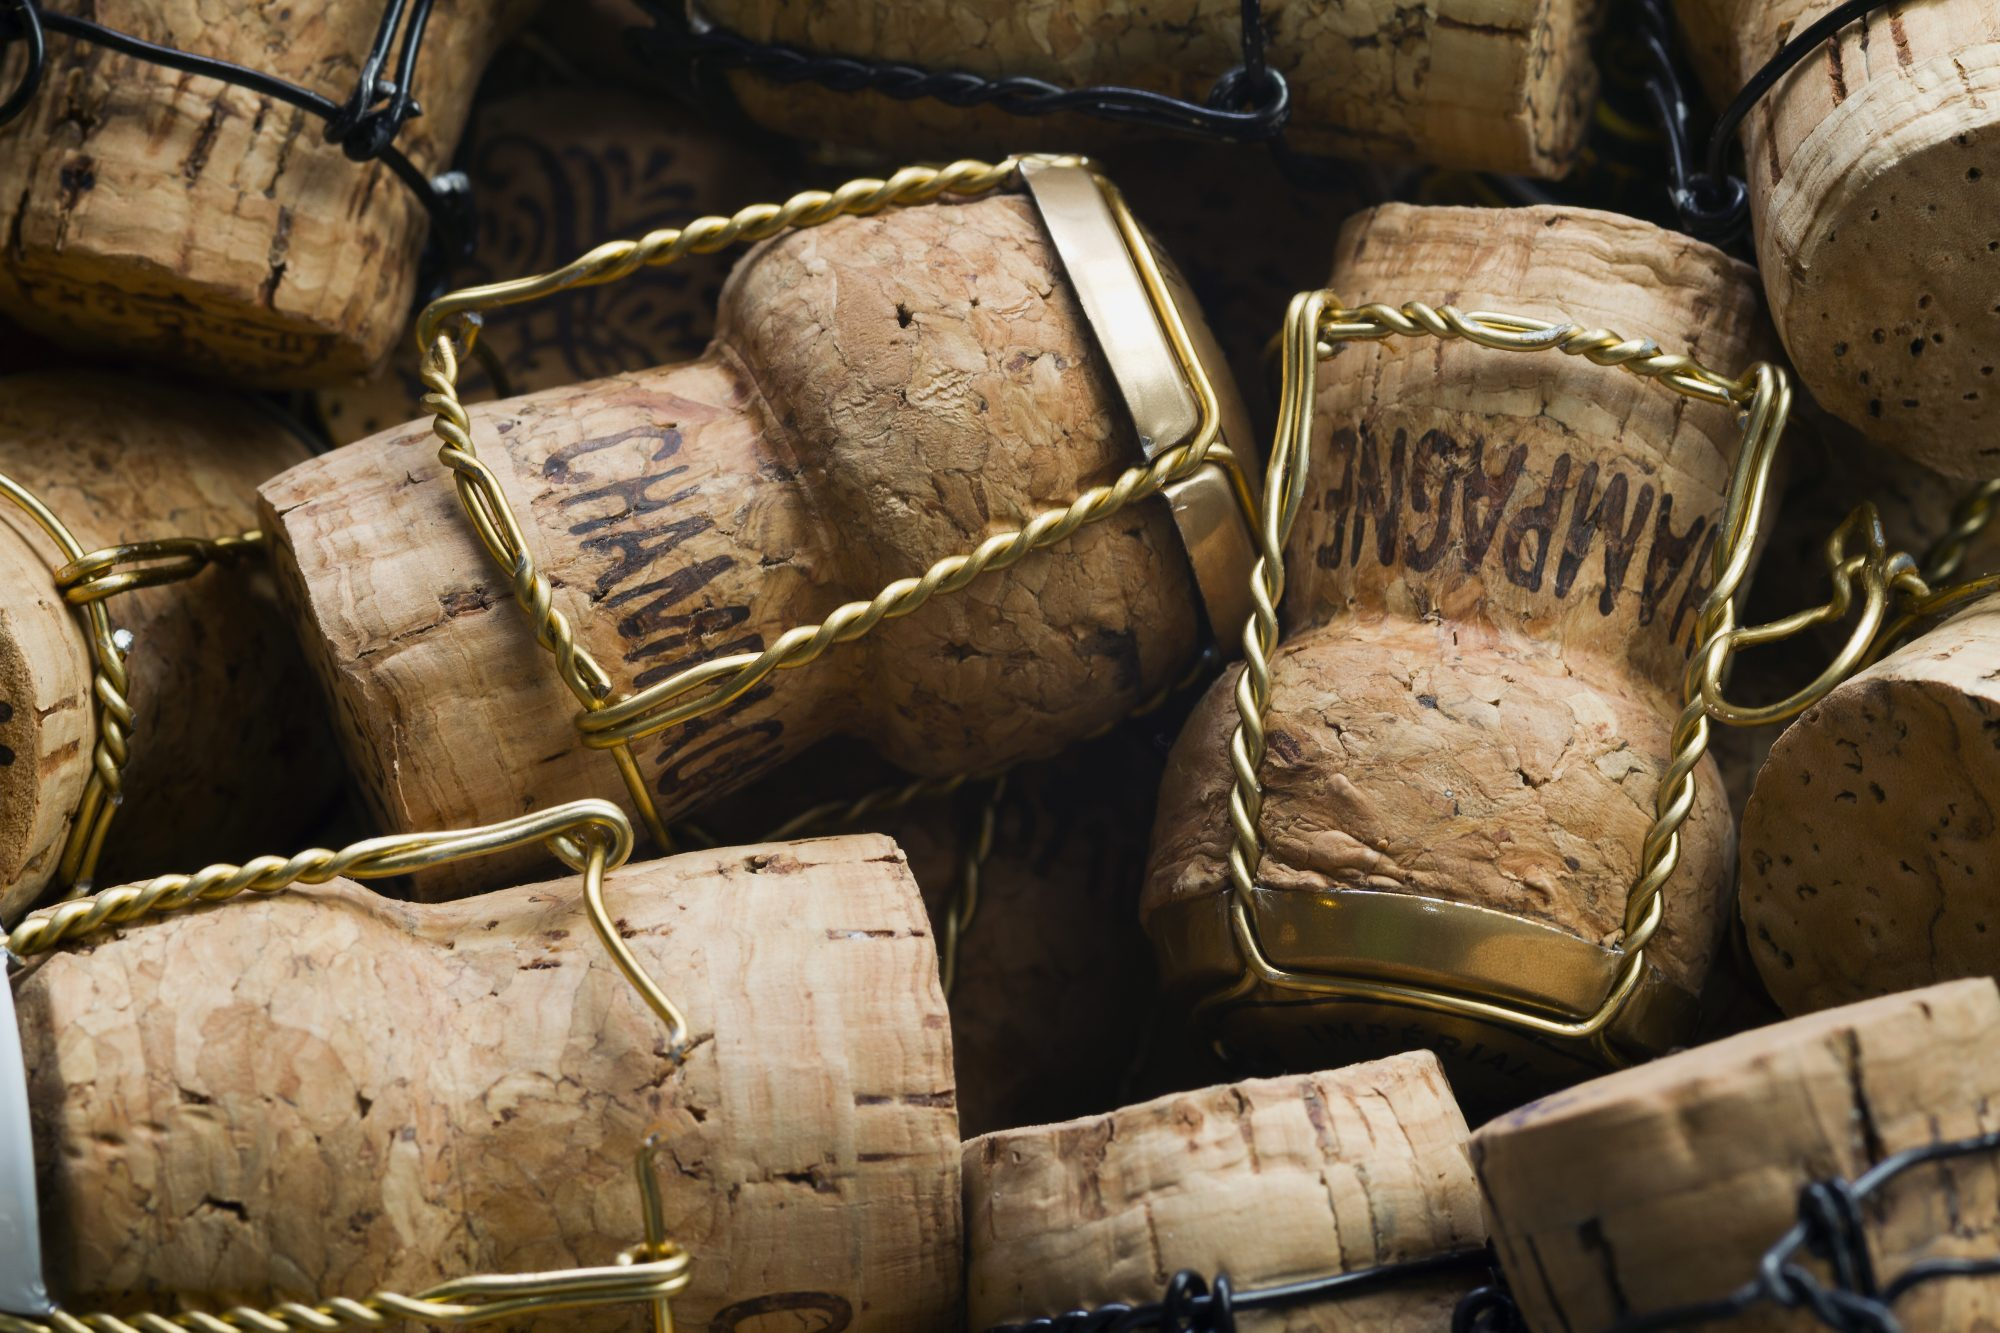 Champagne corks Getty 9/22/20